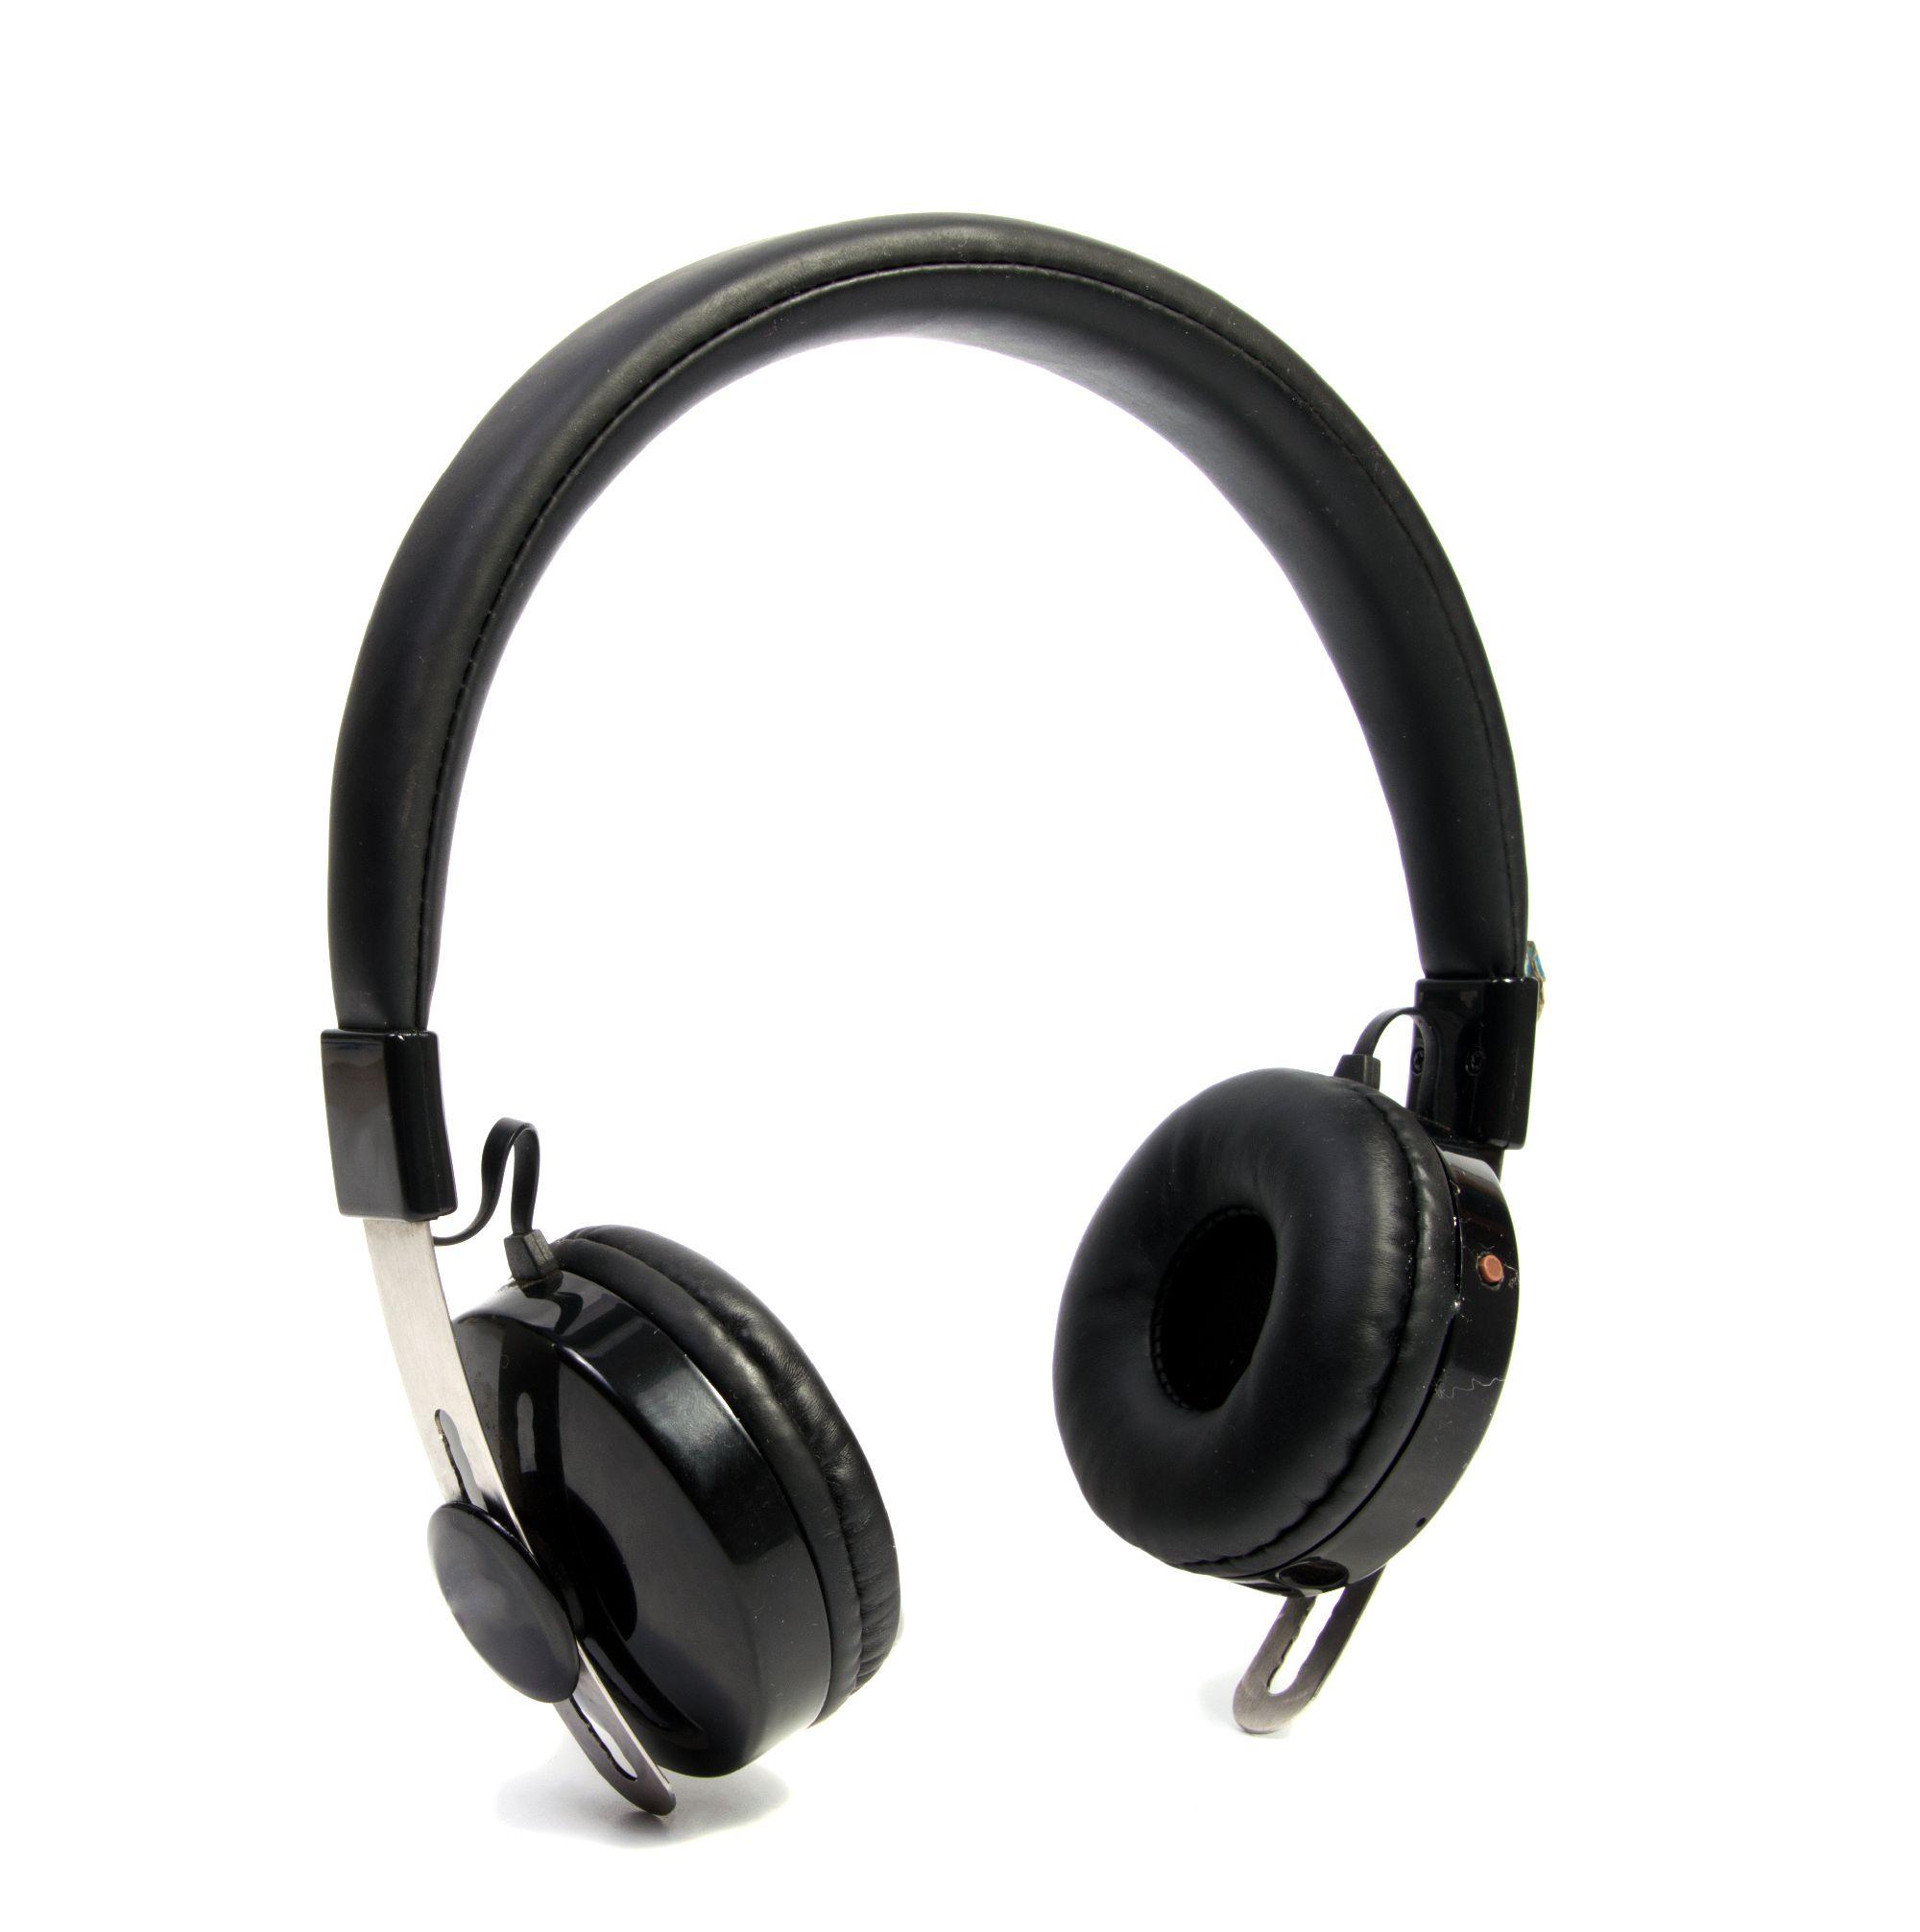 Sony WH 1000XM2 trådløs hodetelefon med mikrofon | Clas Ohlson